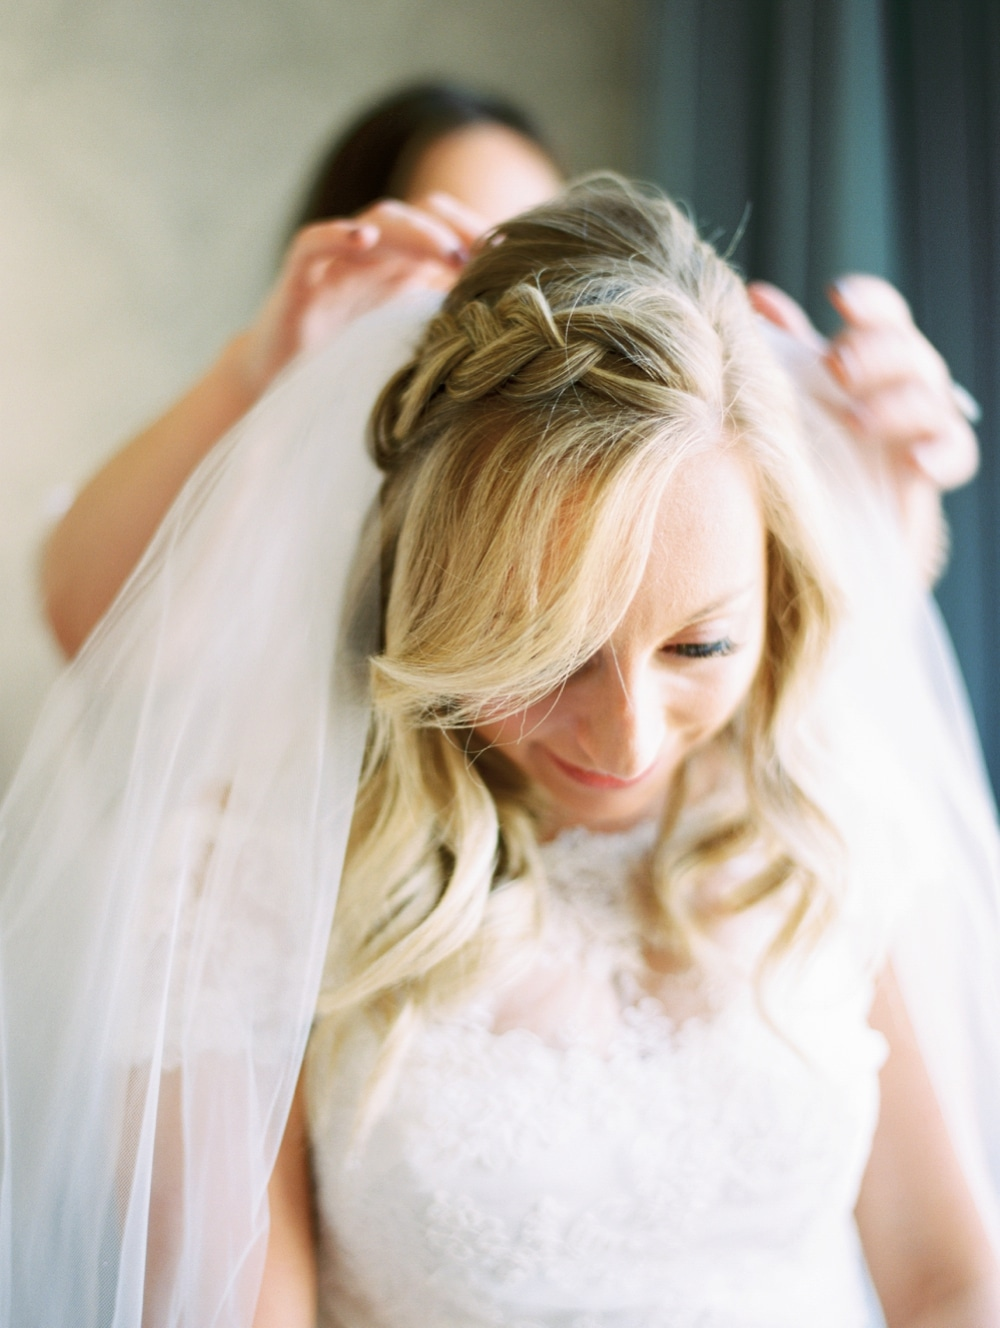 kristin-la-voie-photography-Cafe-Brauer-Chicago-Wedding-Photographer-89